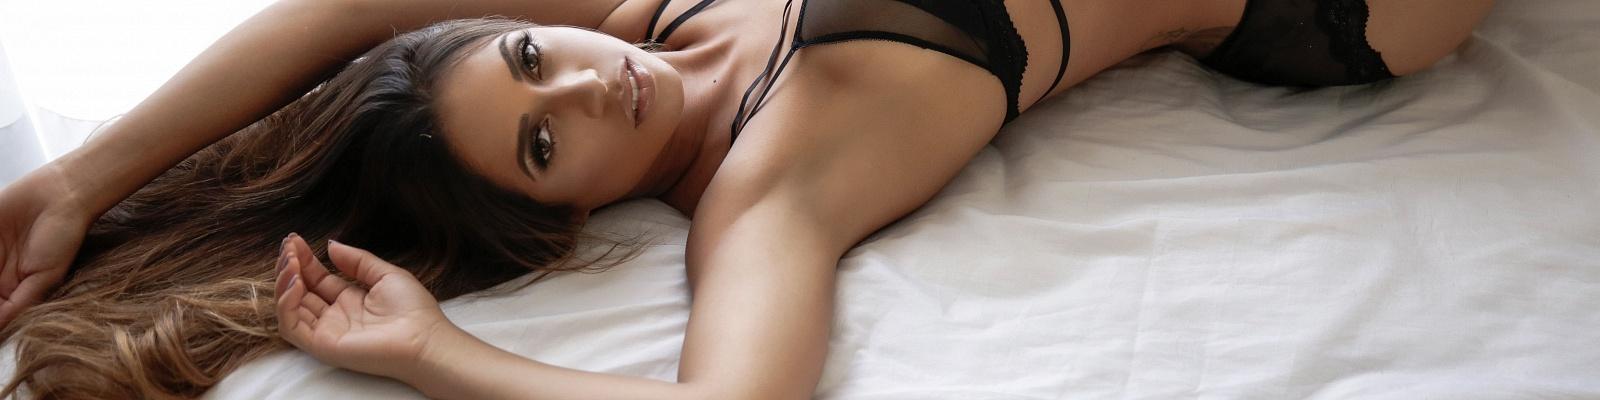 Julia Amorim's Cover Photo